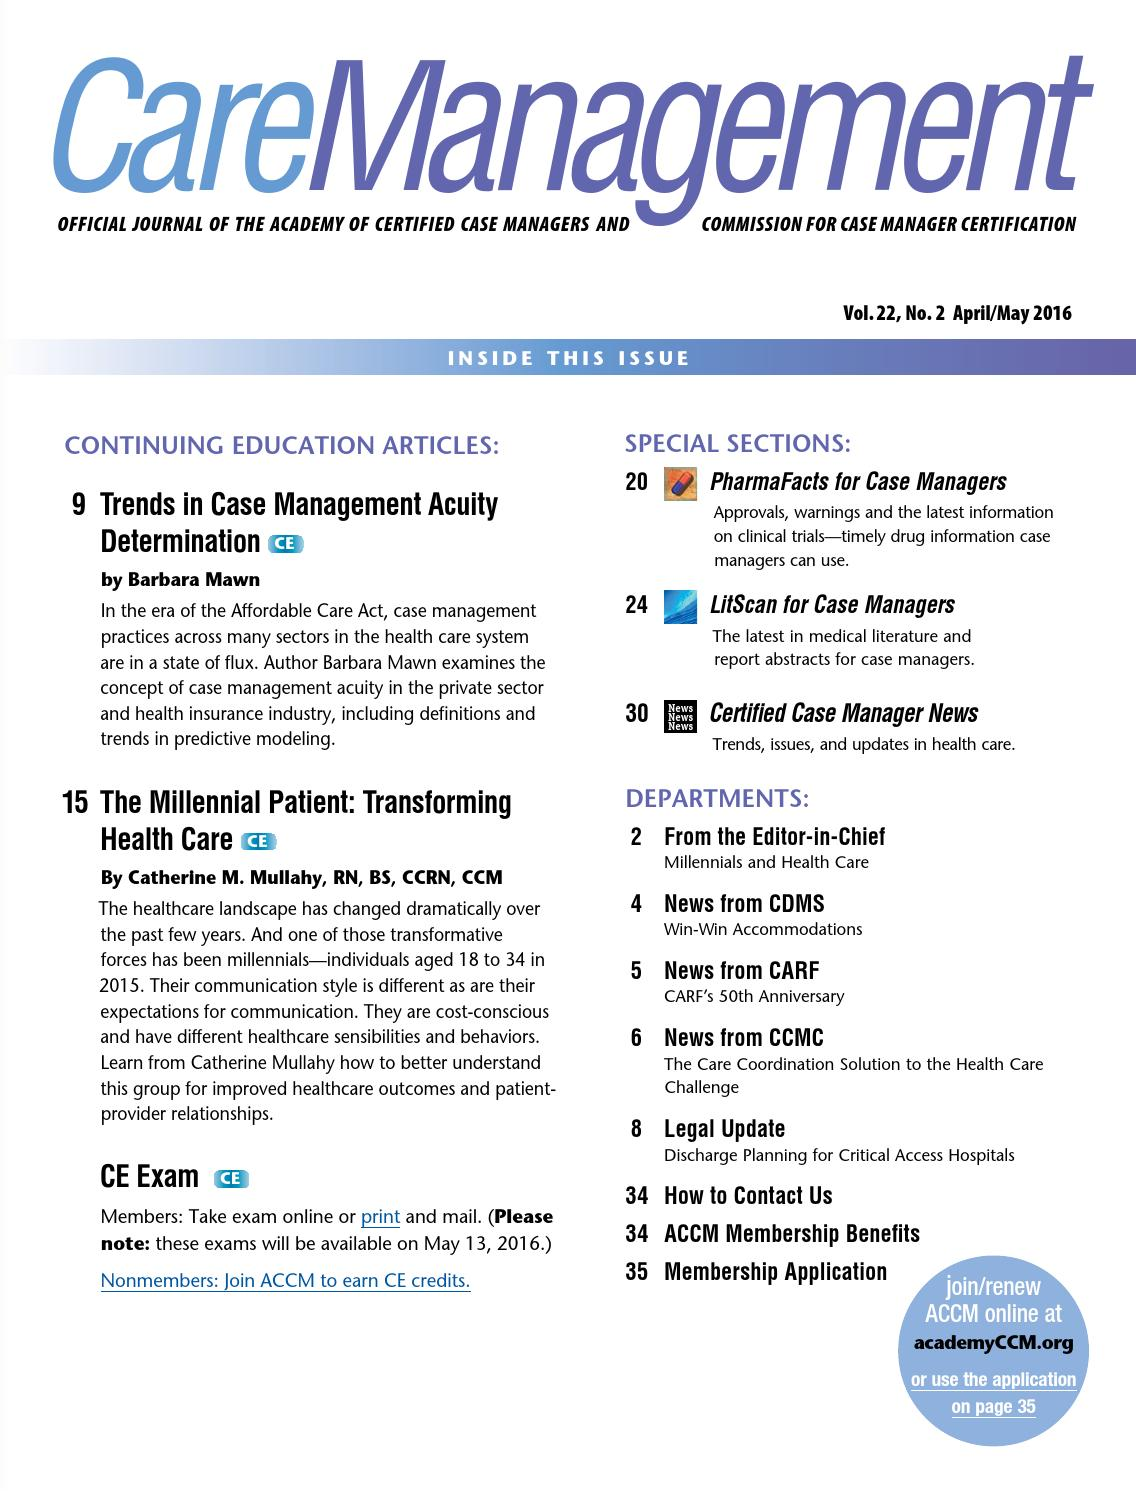 CareManagement April/May 2016 by CareManagement - issuu